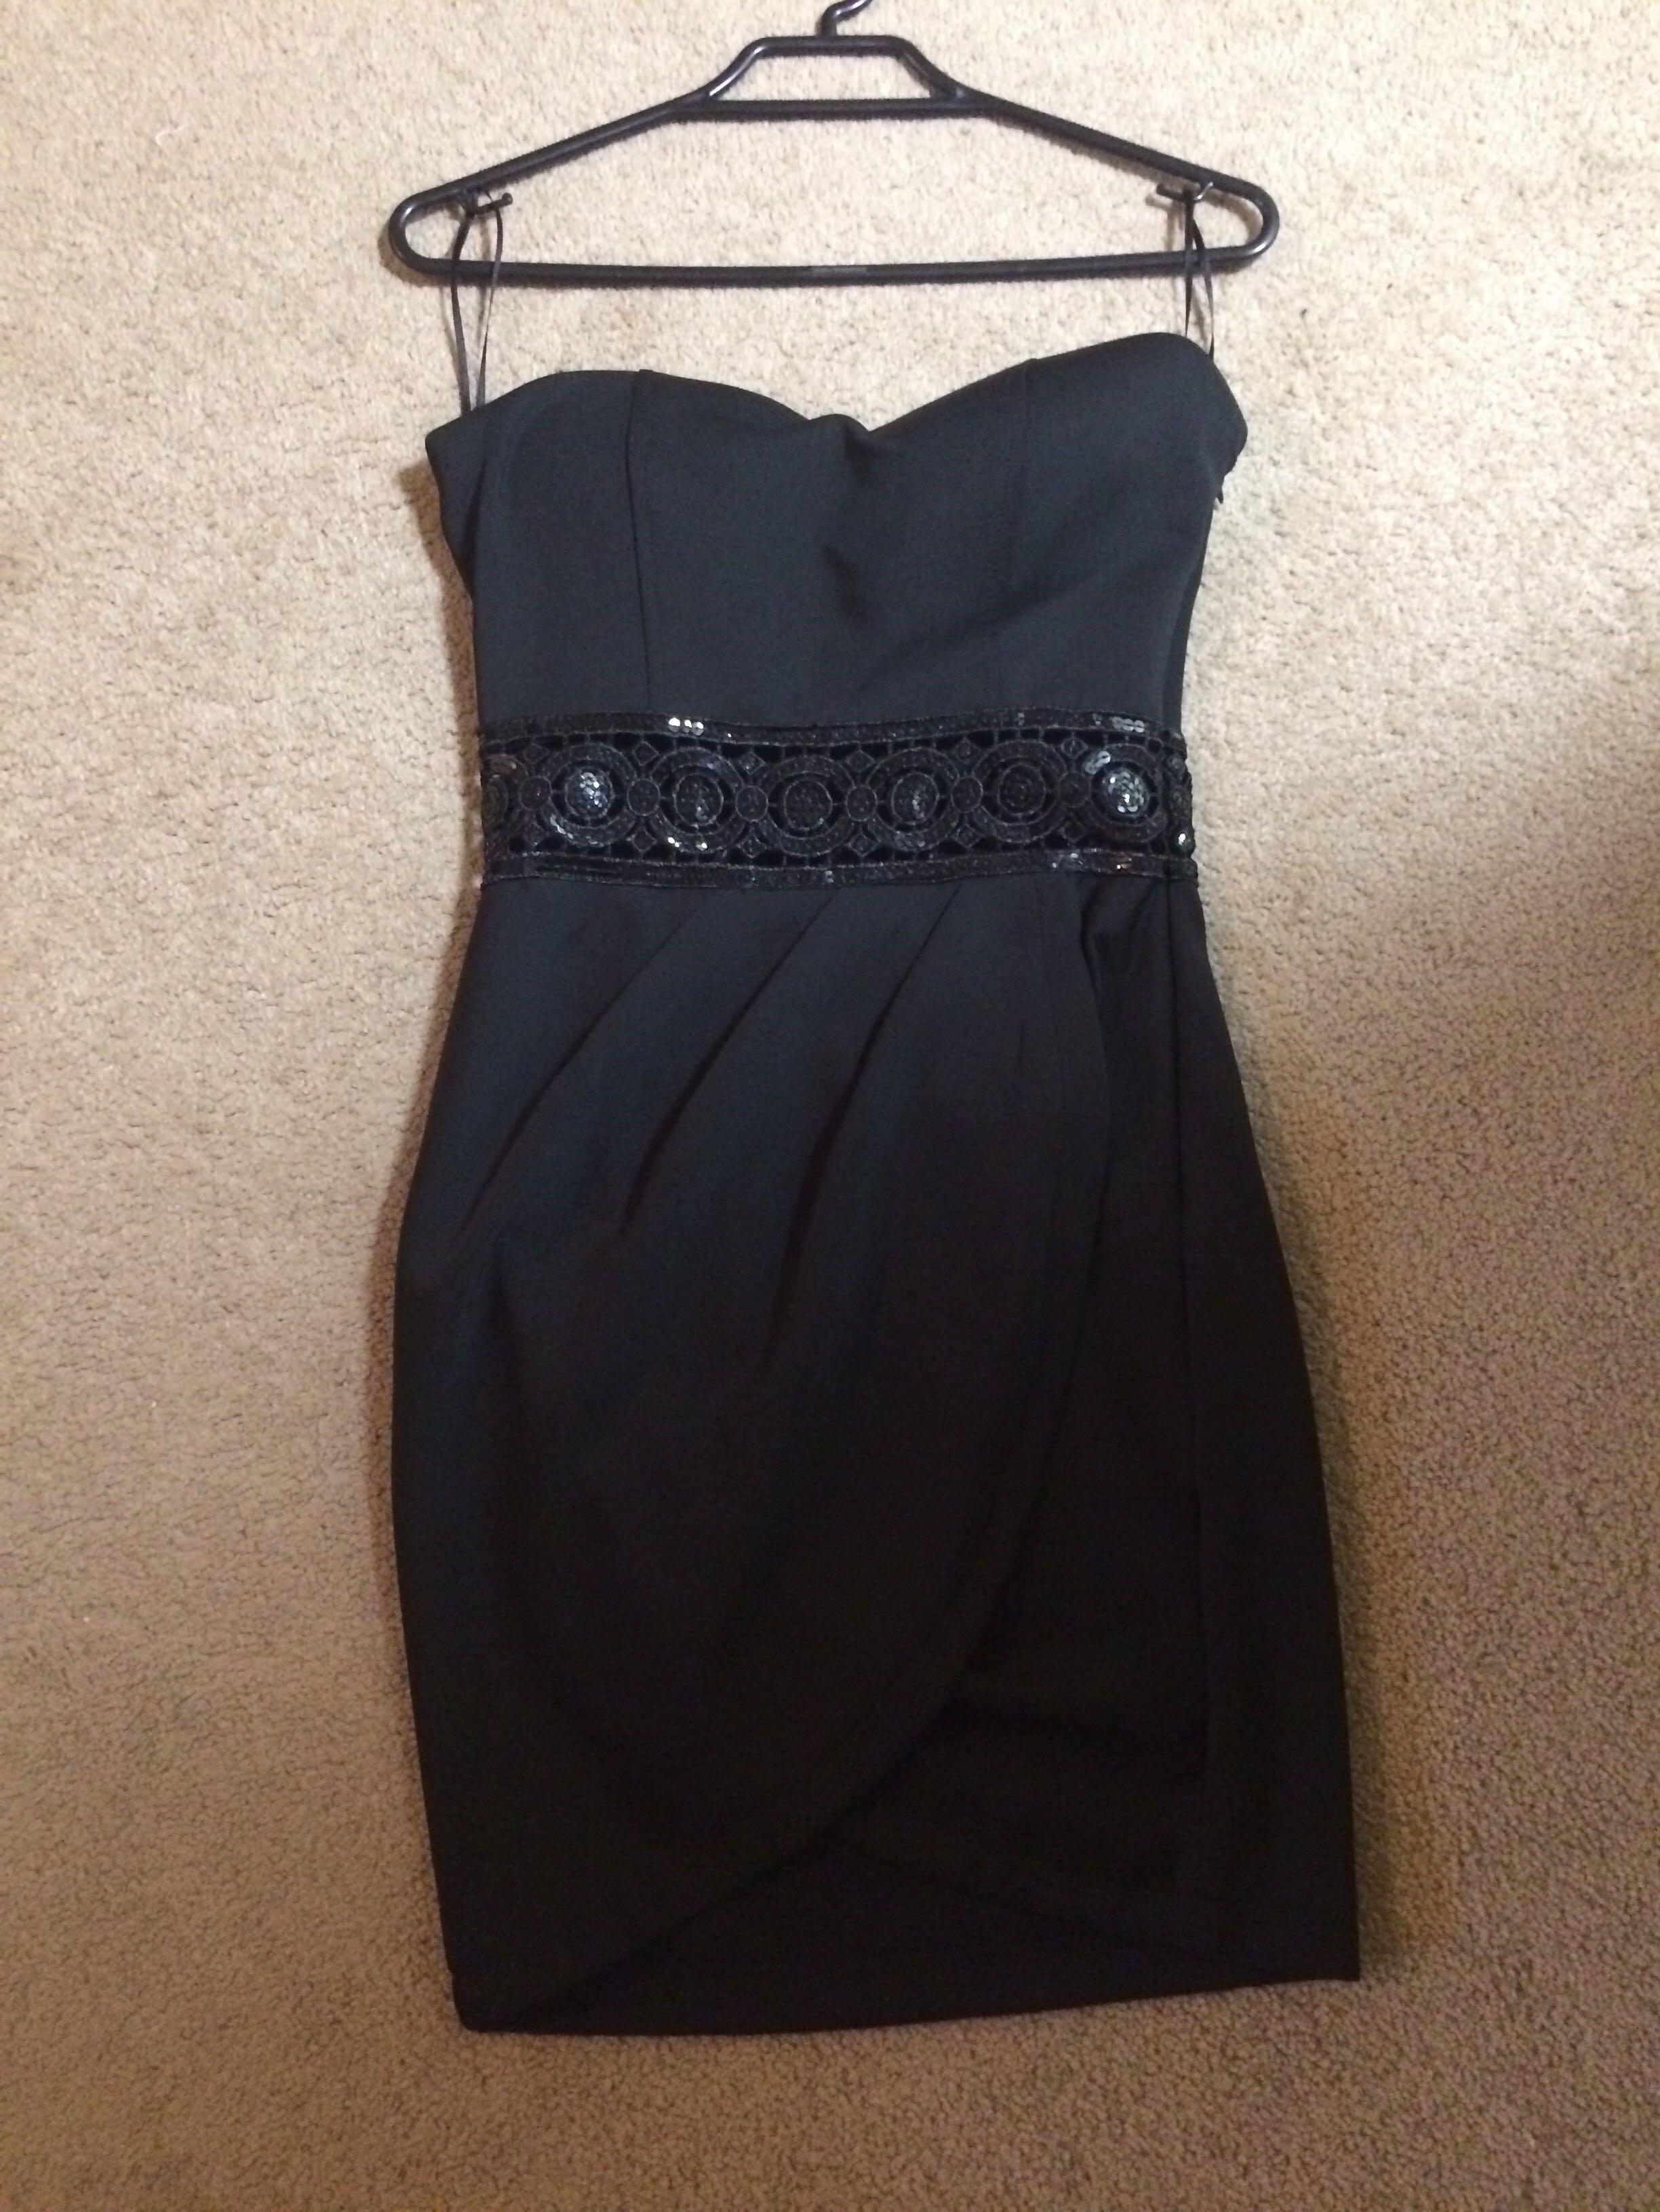 Black strapless dress (size 6)